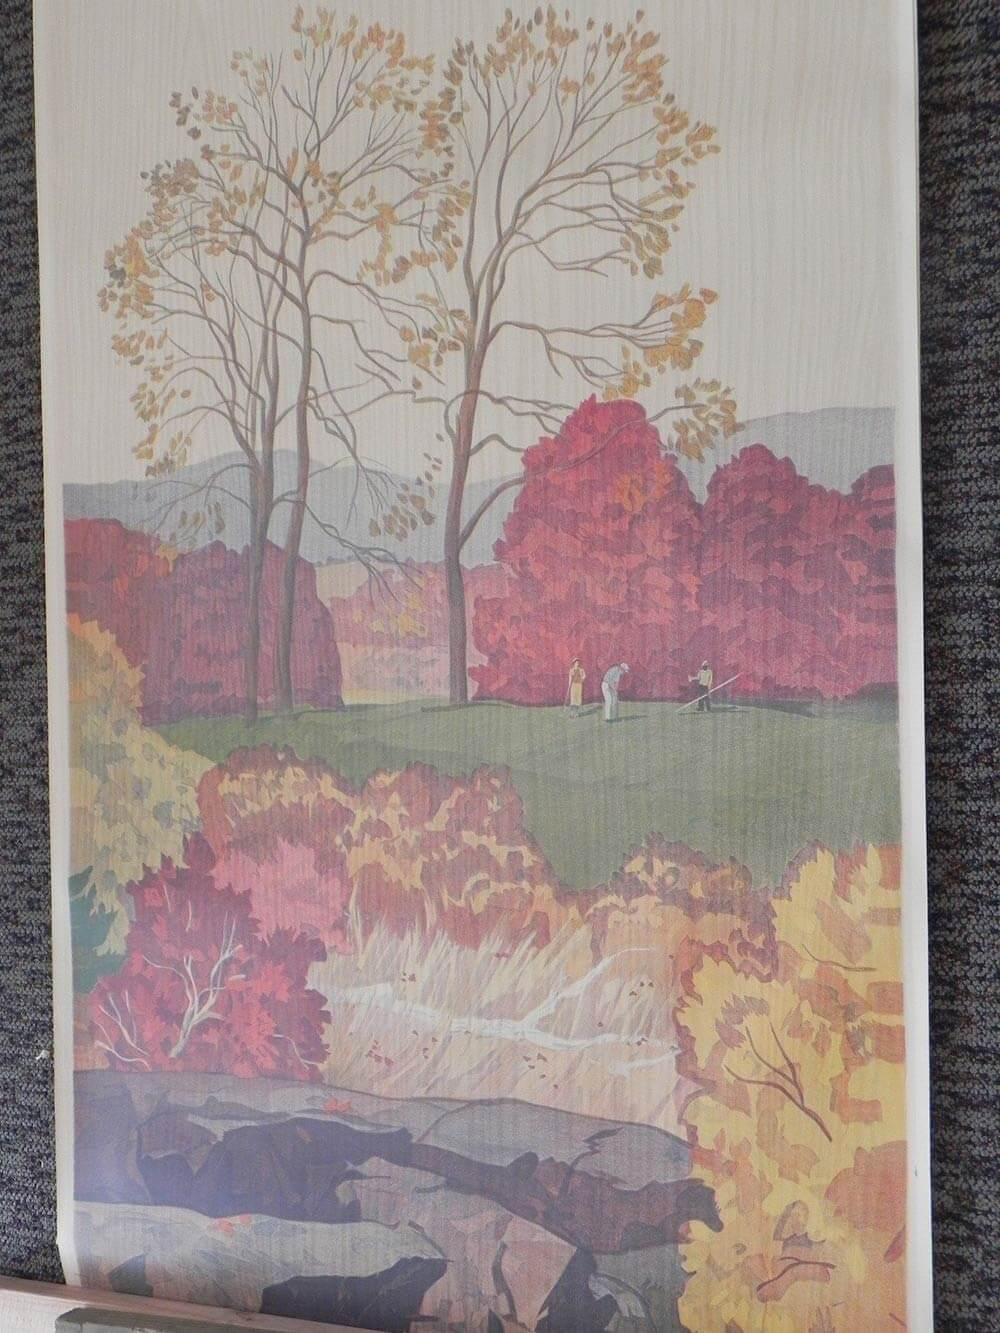 Full Room Vintage Wallpaper Murals By The Schmitz Horning Co Retro Renovation